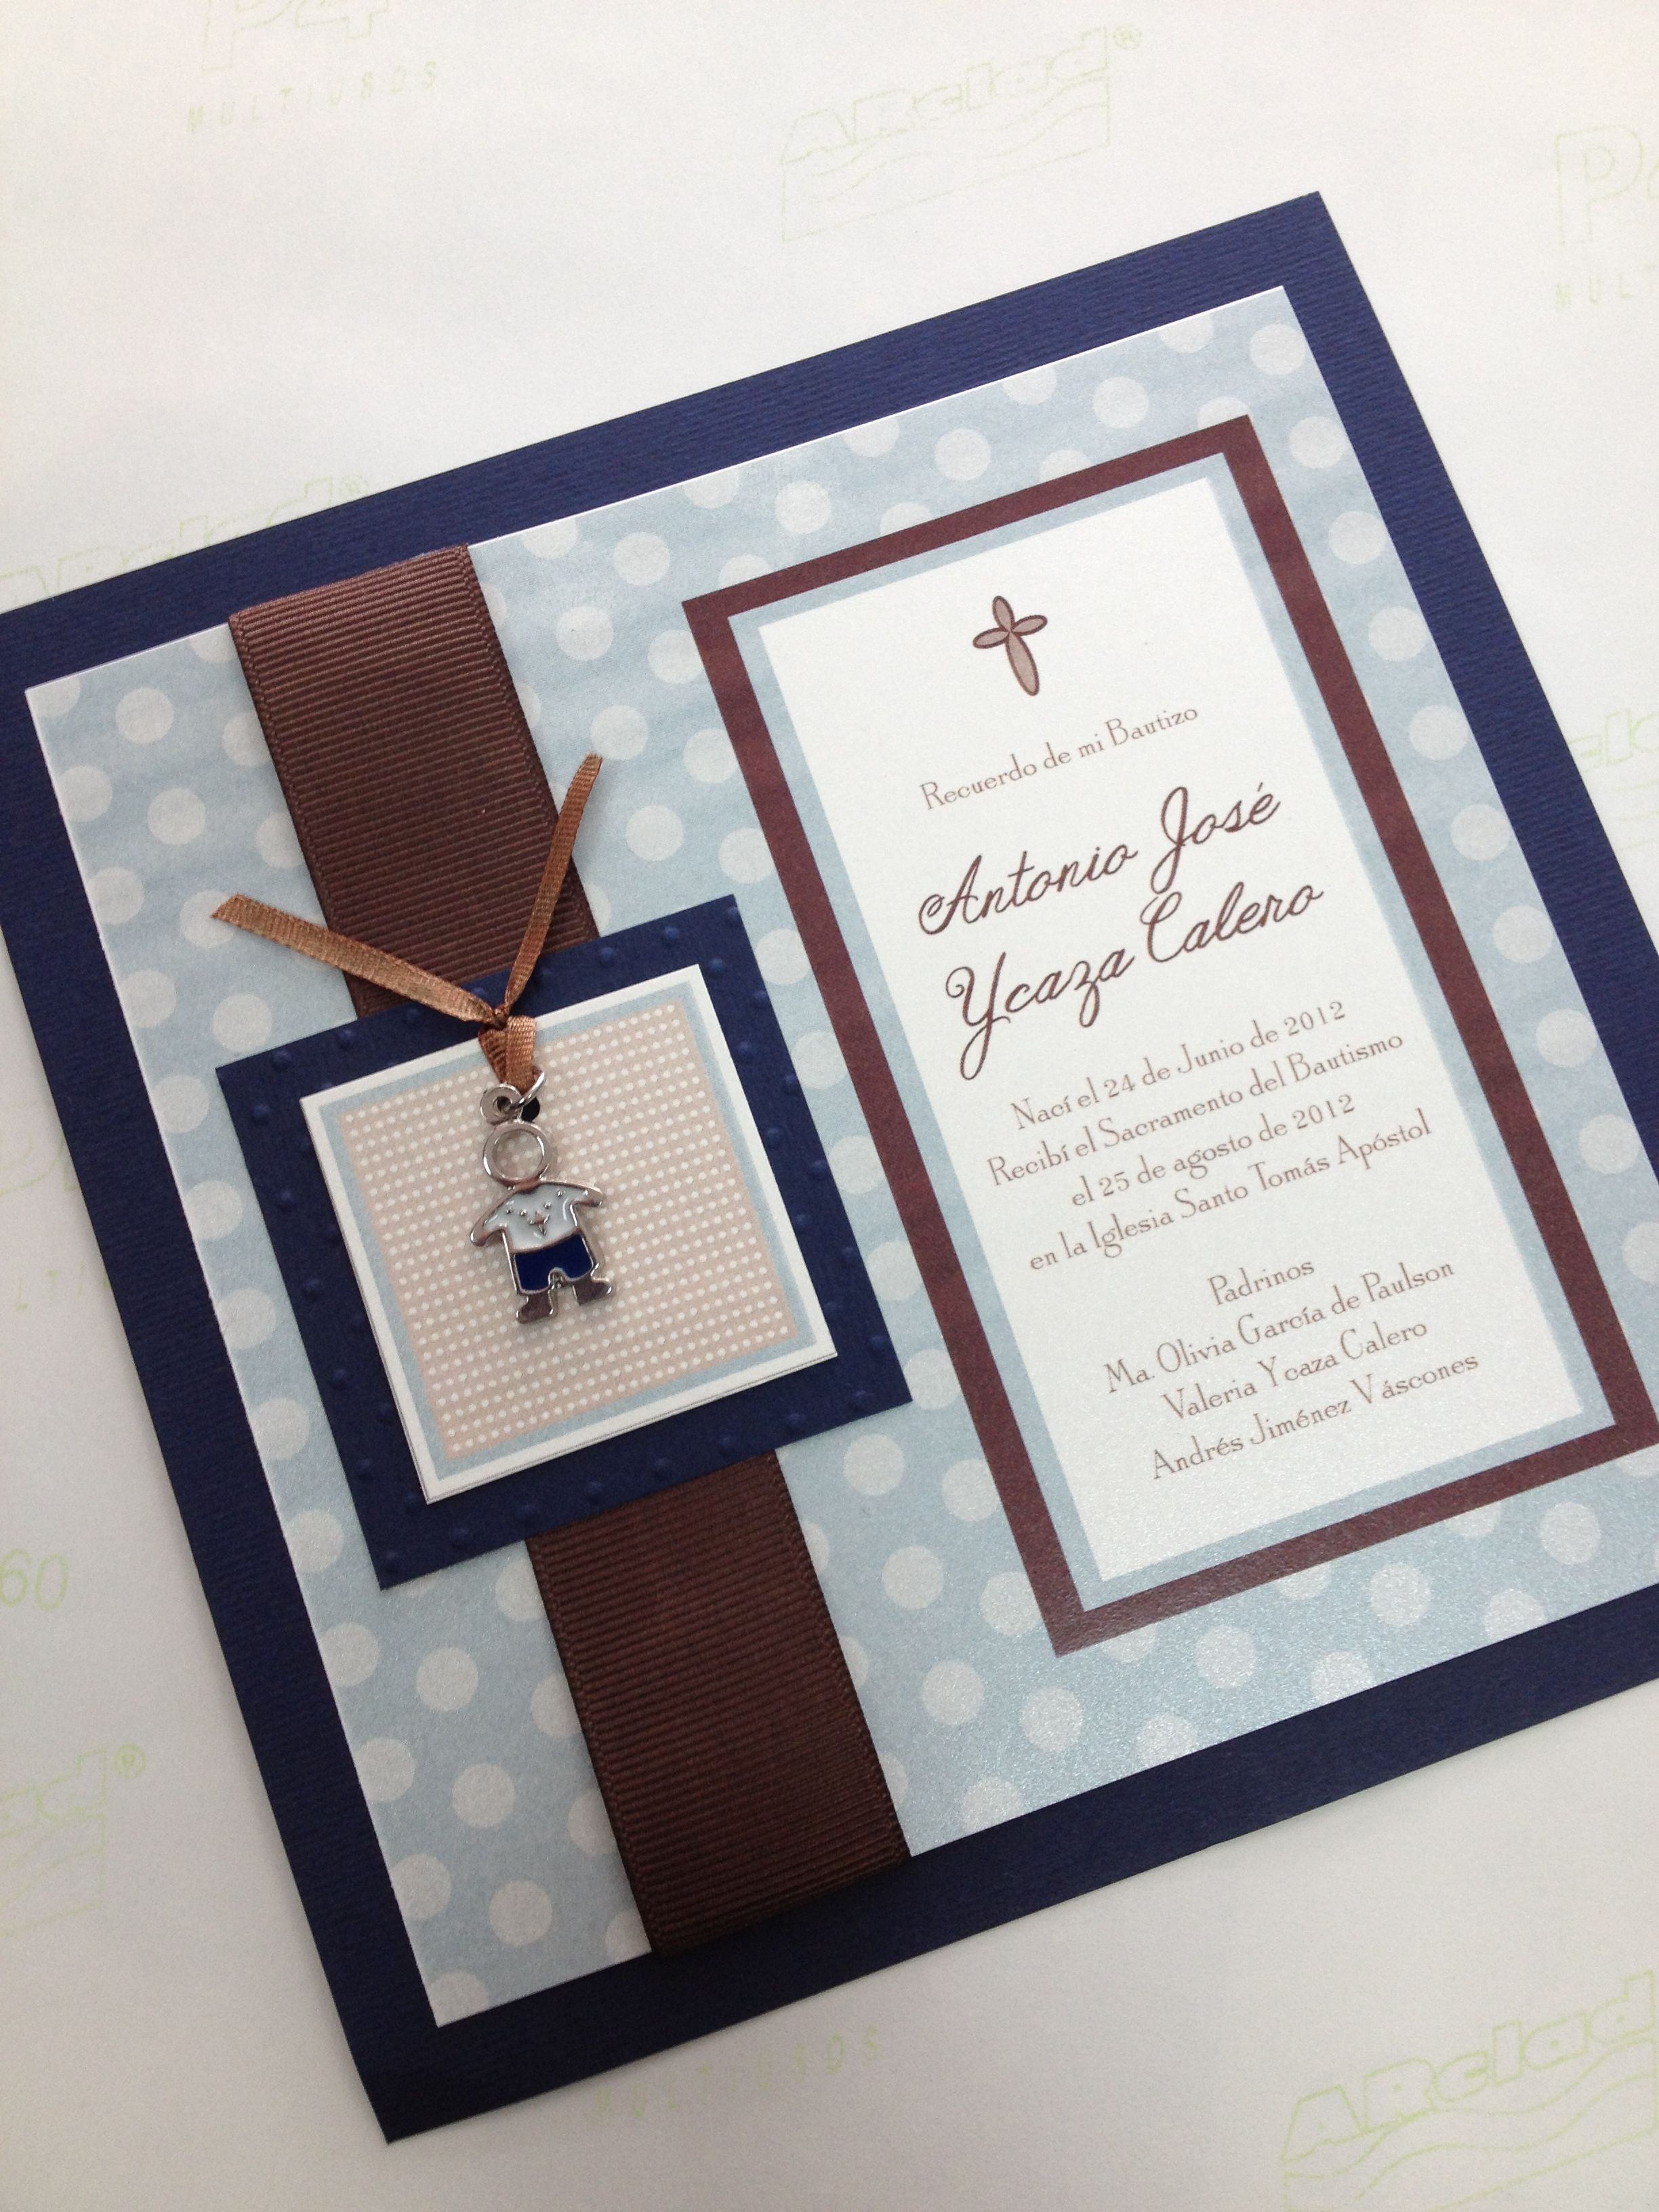 Customized Invitation Card Christening